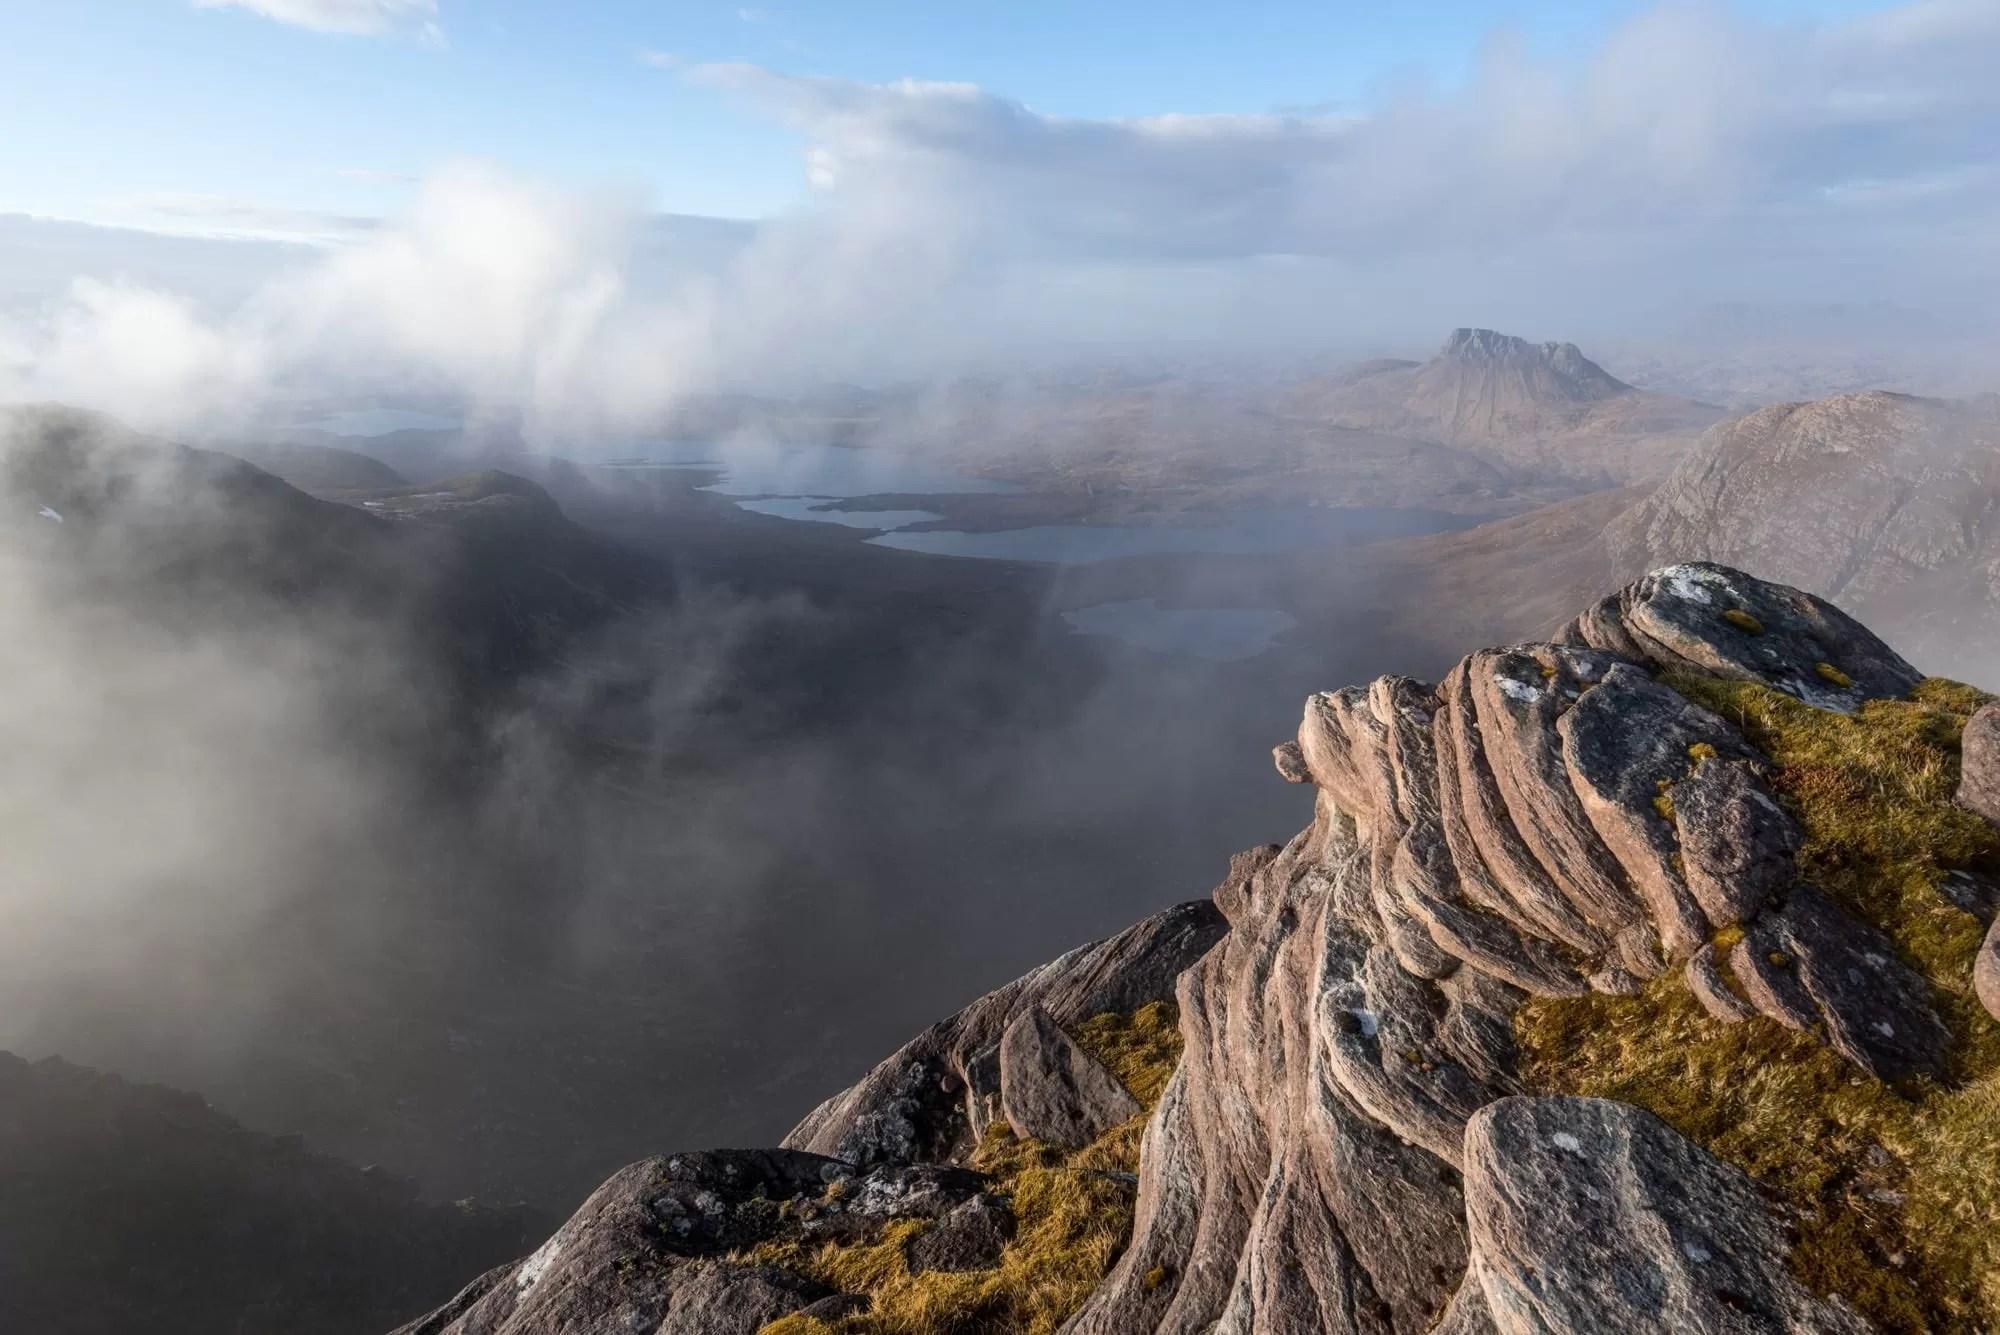 The Fiddler - Sgurr an Fhidlheir - Scotland Photography Workshops